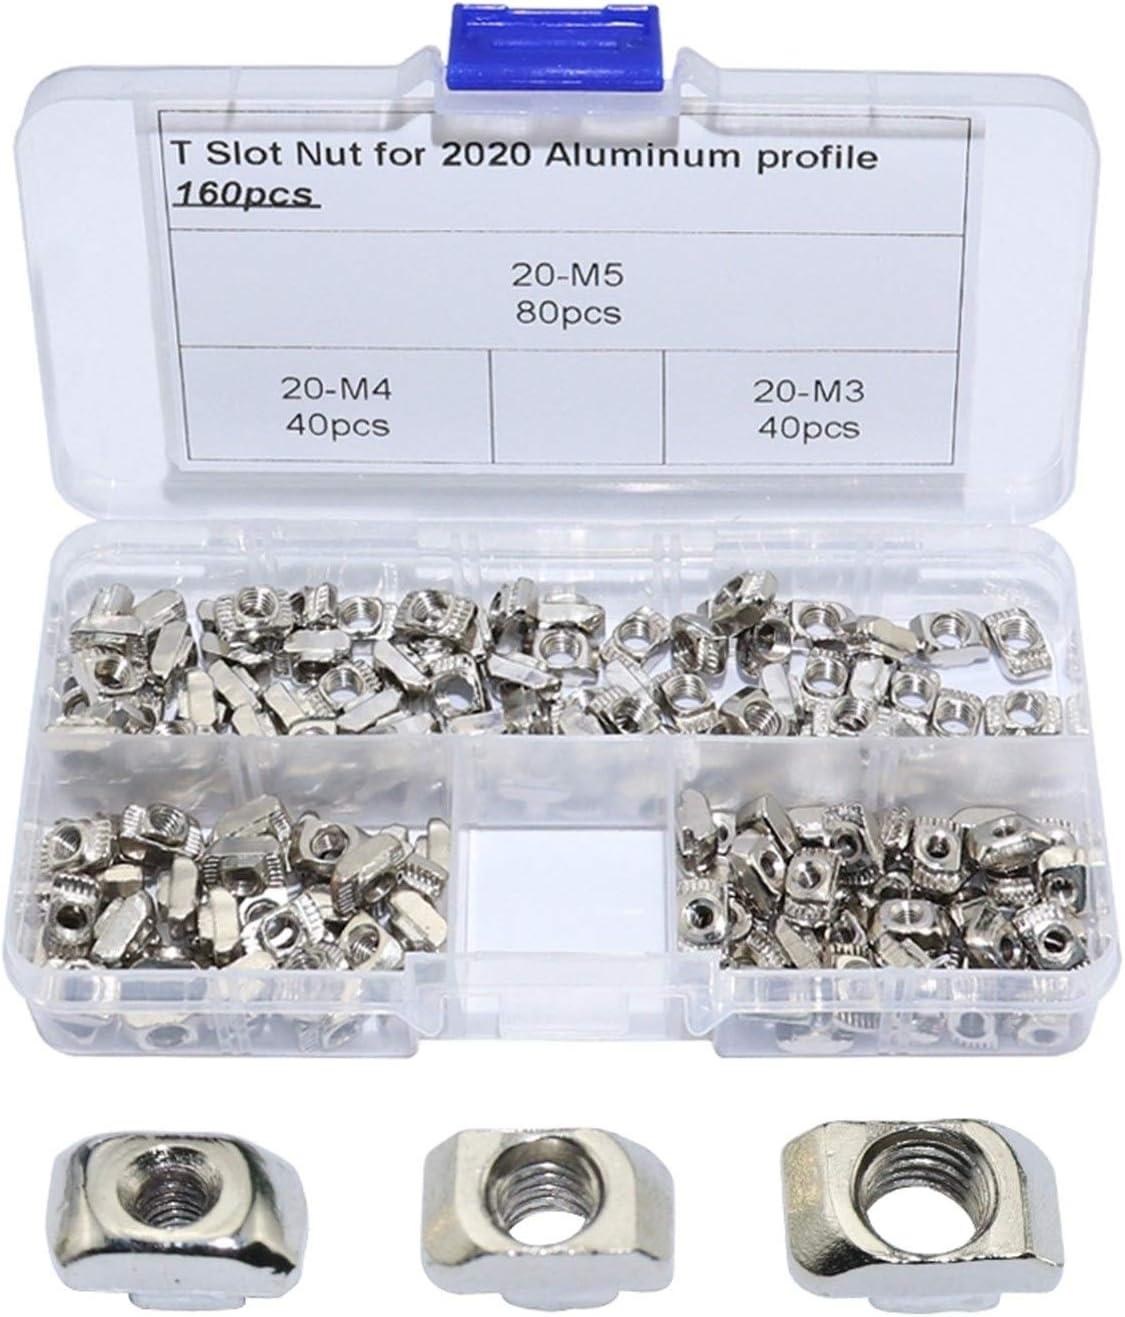 DUO ER 160pcs T Nut Assortment Kits M4 M5 E Aluminum M3 Our shop most popular 2020 Topics on TV for